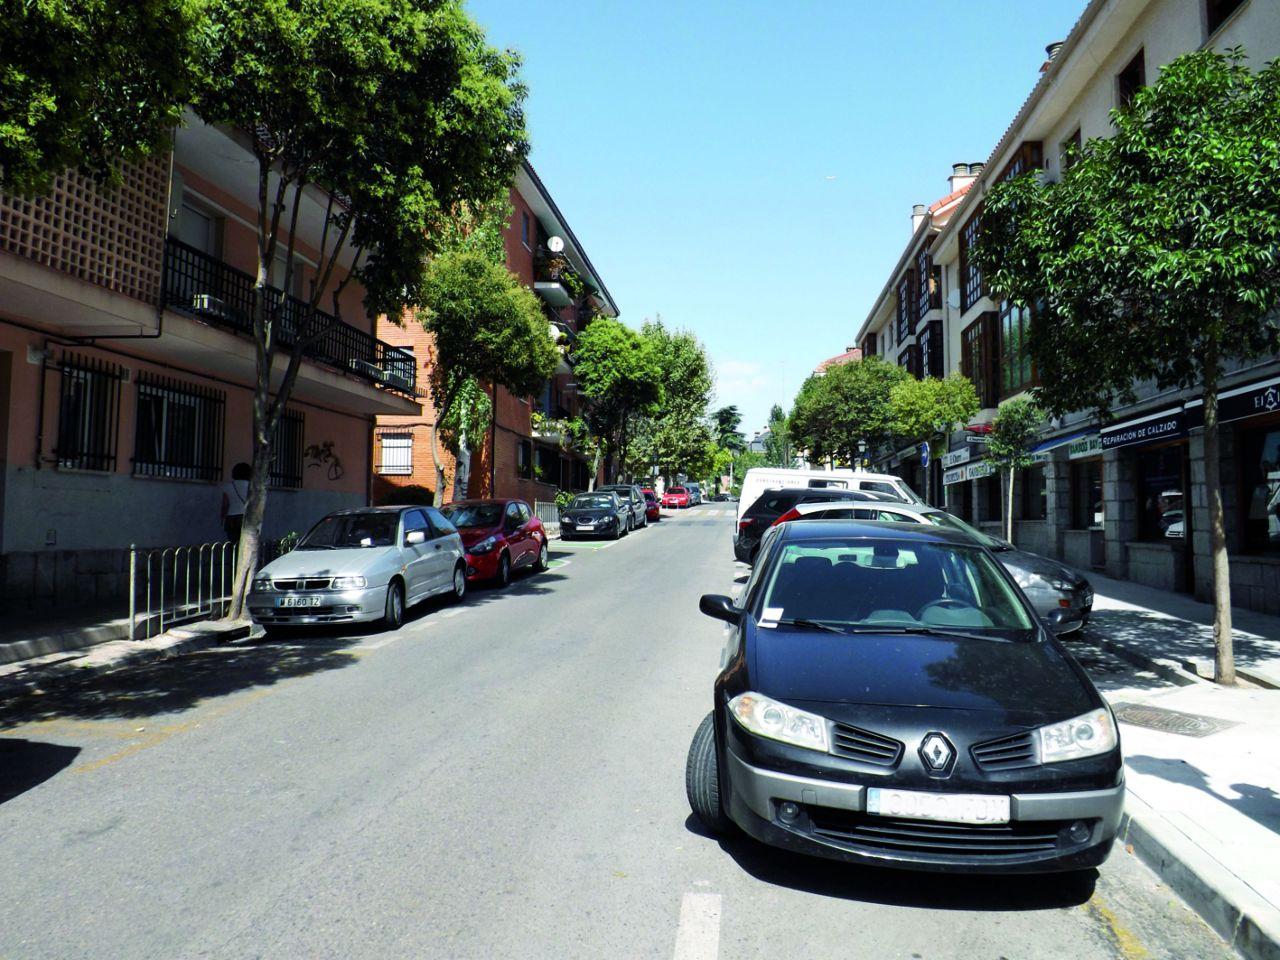 Calle Los Ángeles